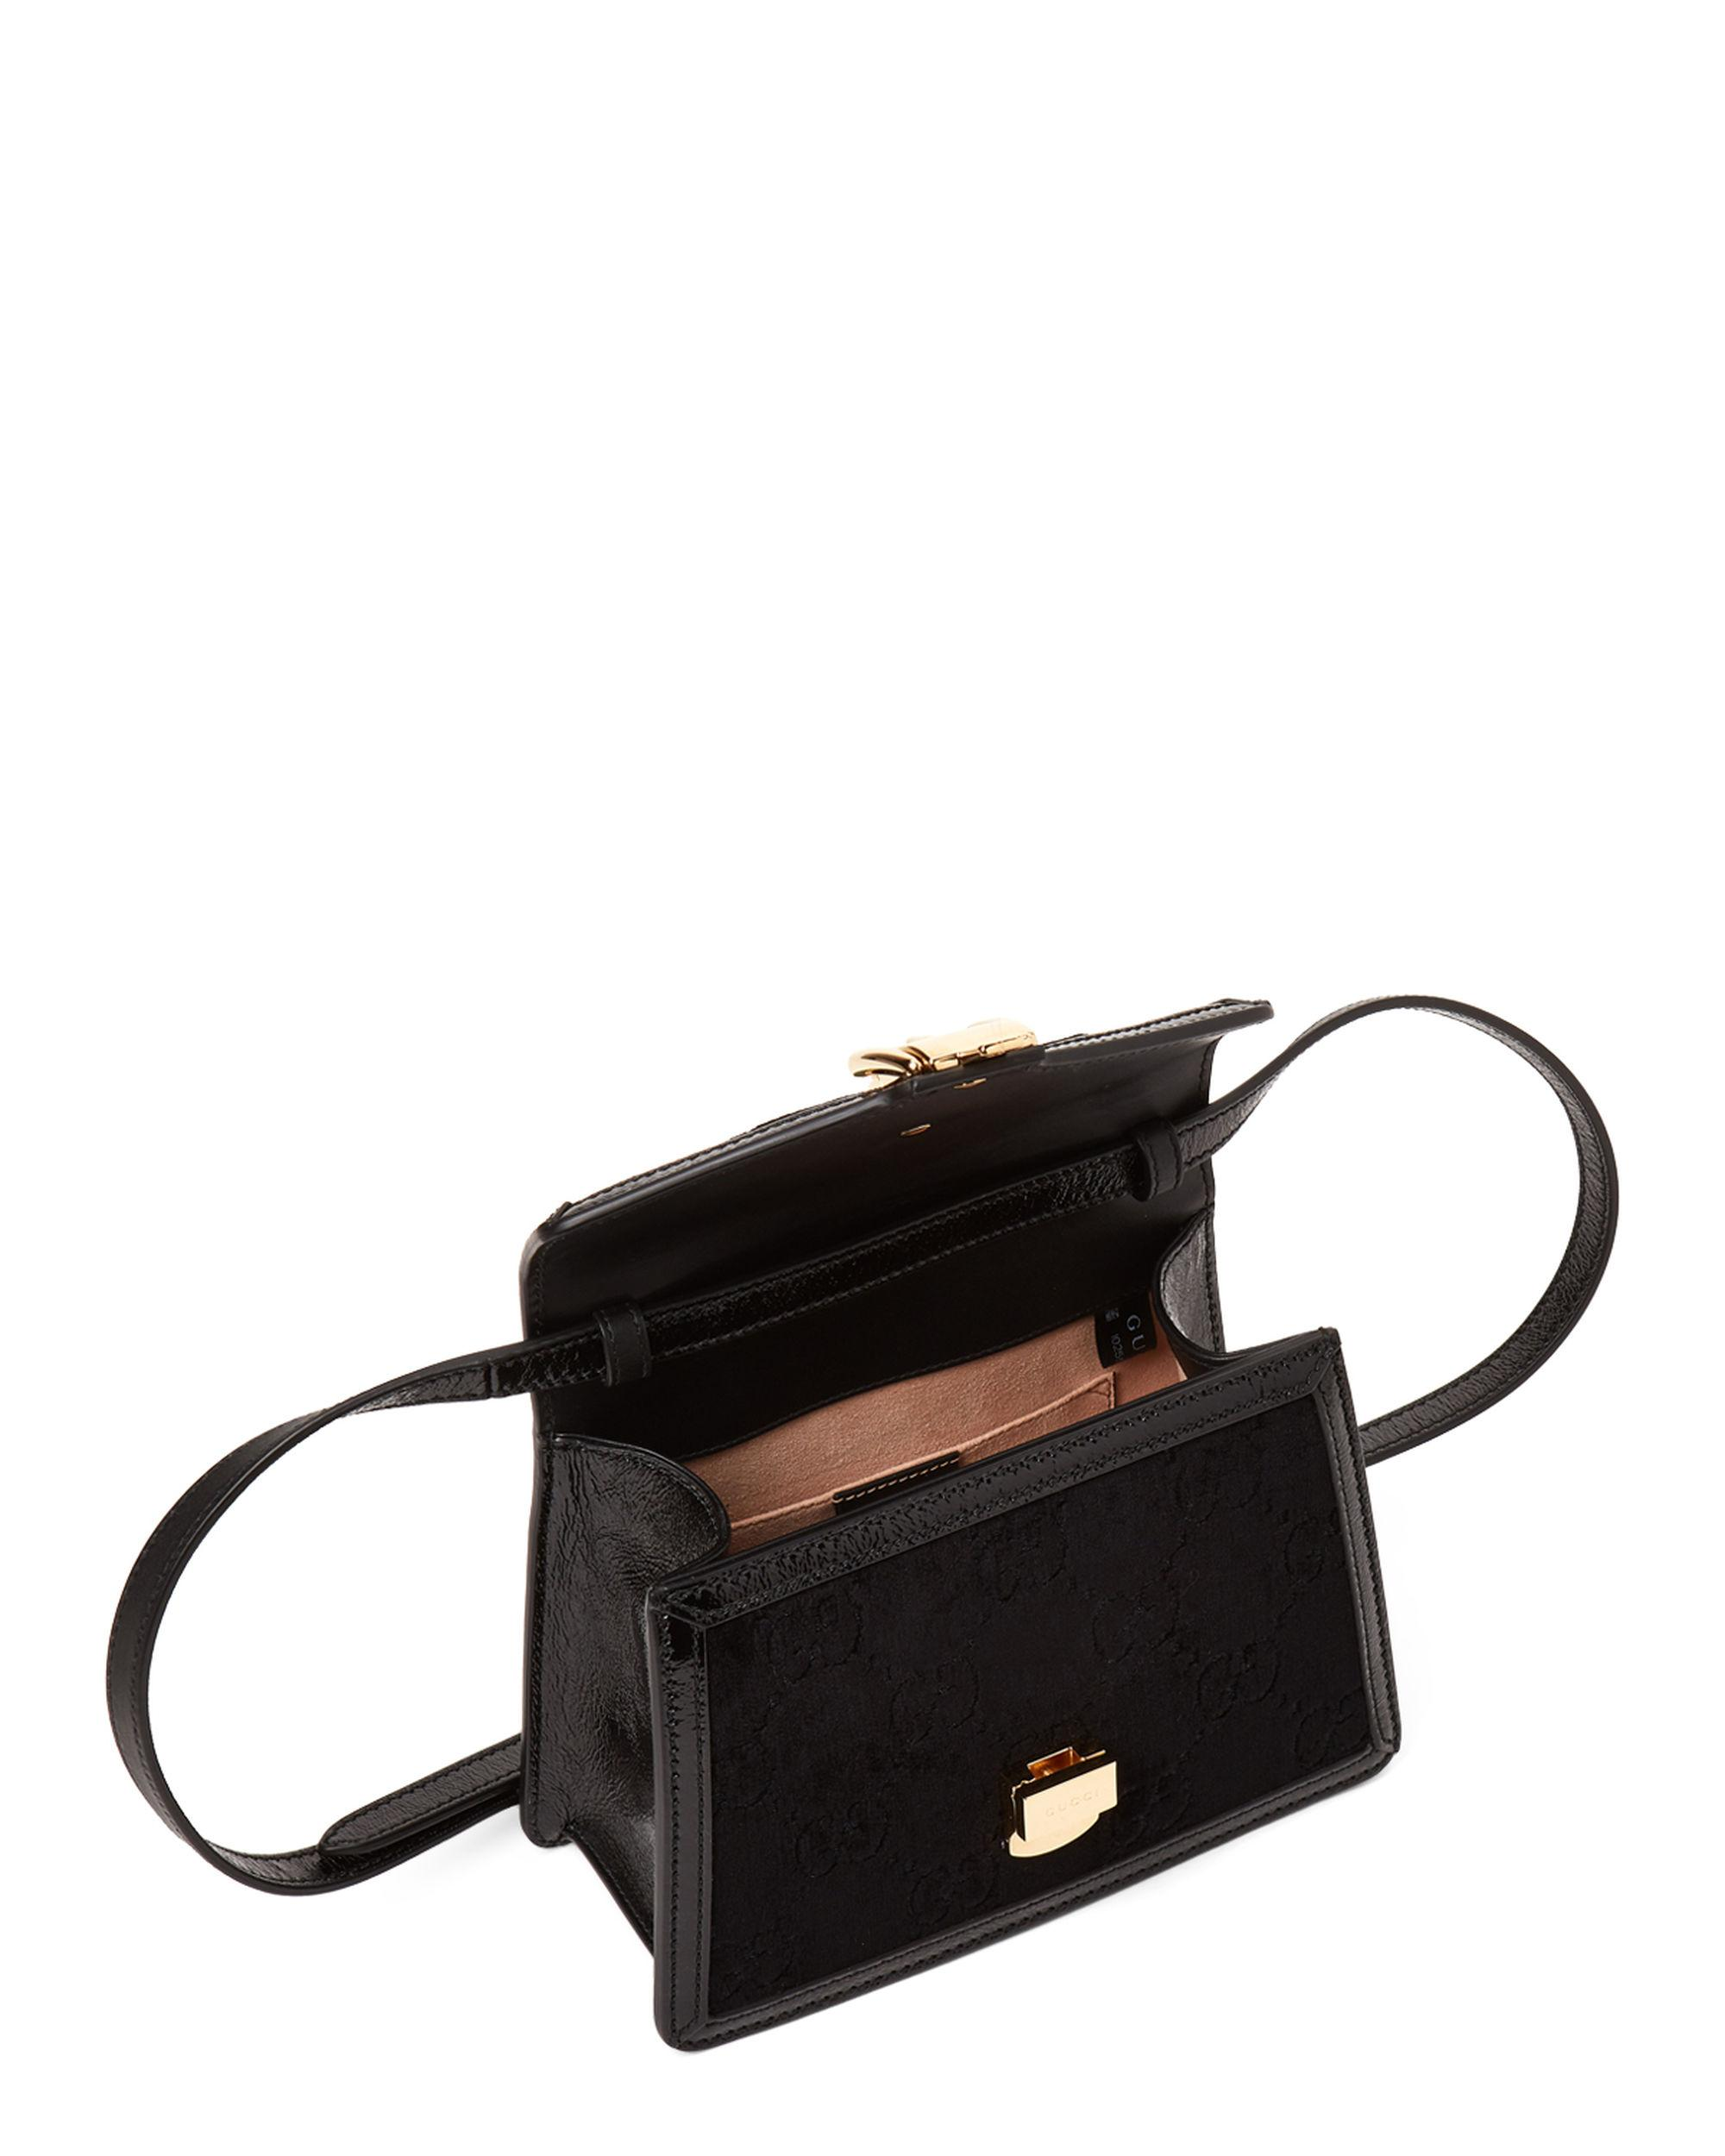 627ca4f6023 Lyst - Gucci Black Sylvie GG Velvet Mini Top Handle Bag in Black